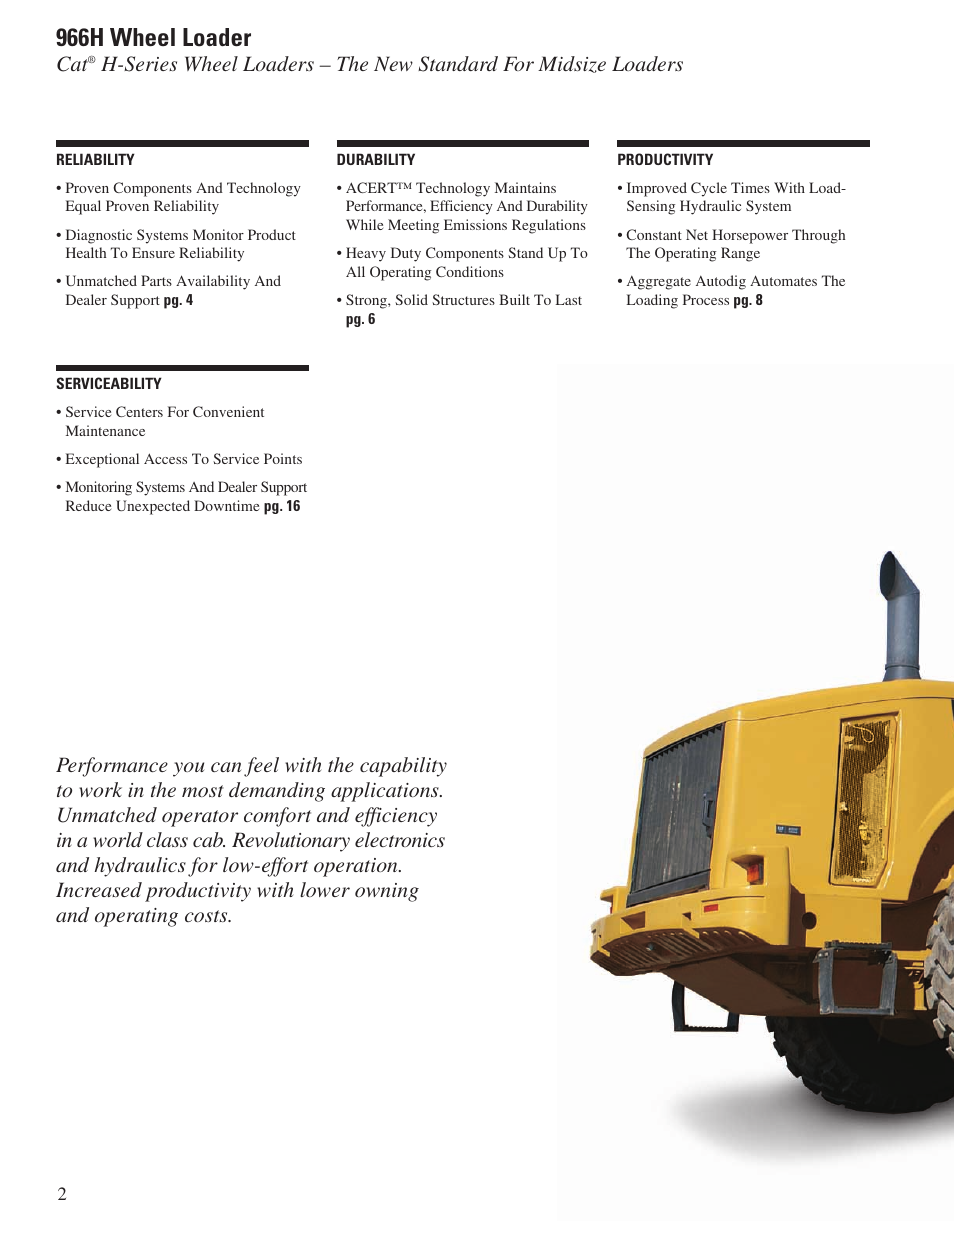 966h wheel loader milton cat 966h user manual page 2 28 rh manualsdir com cat 966h service manual Cat 988